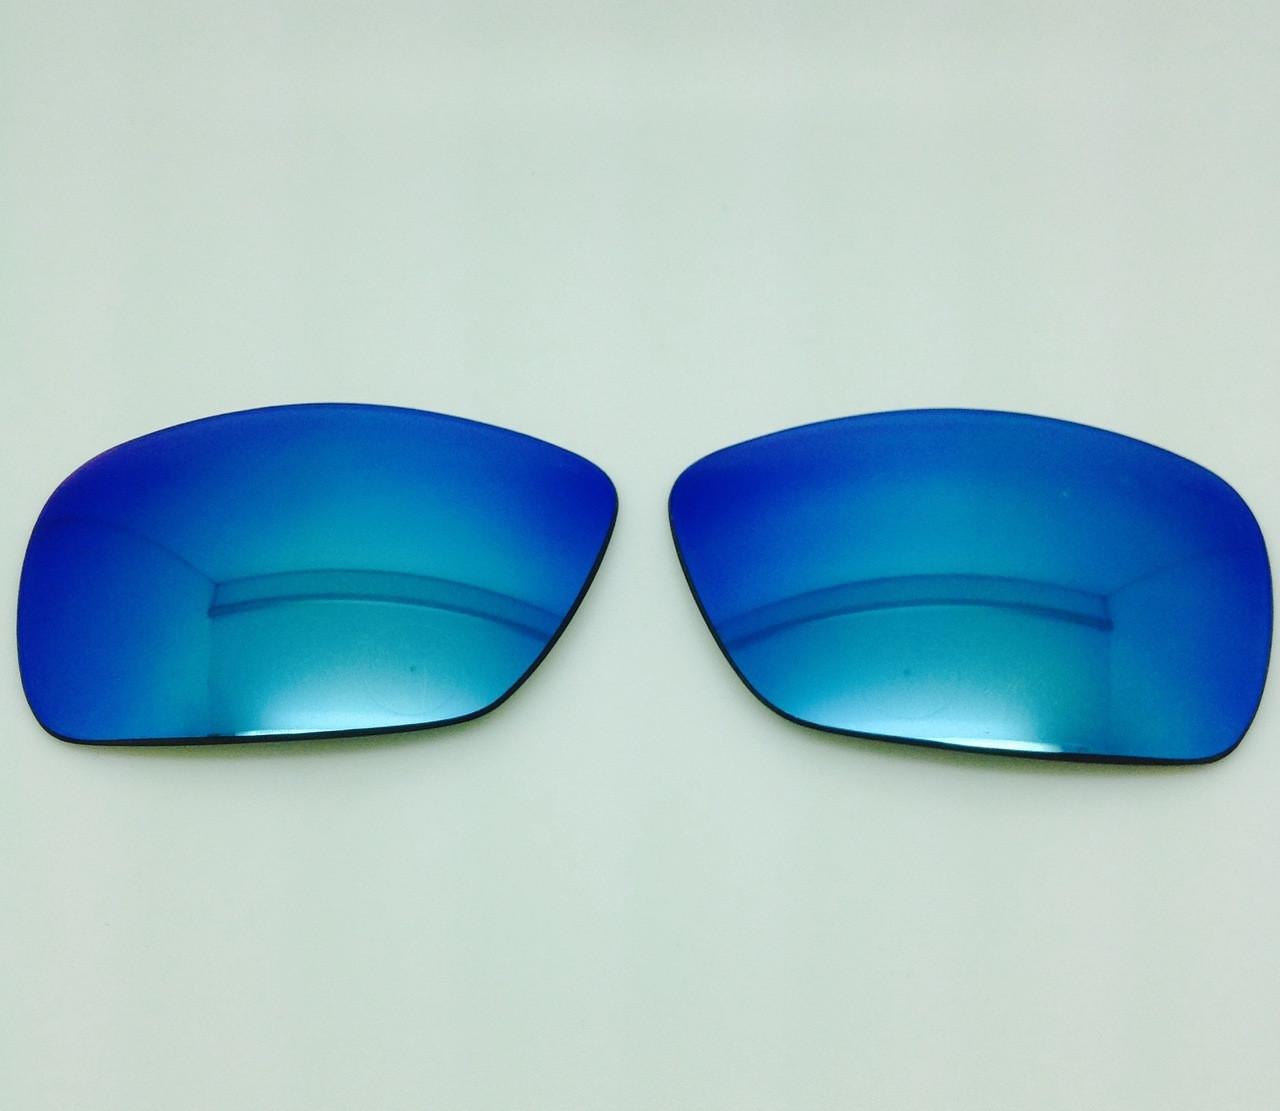 06825bfe529 ... Custom Kaenon Hard Kore Blue Mirror Polarized Lenses. Image 1